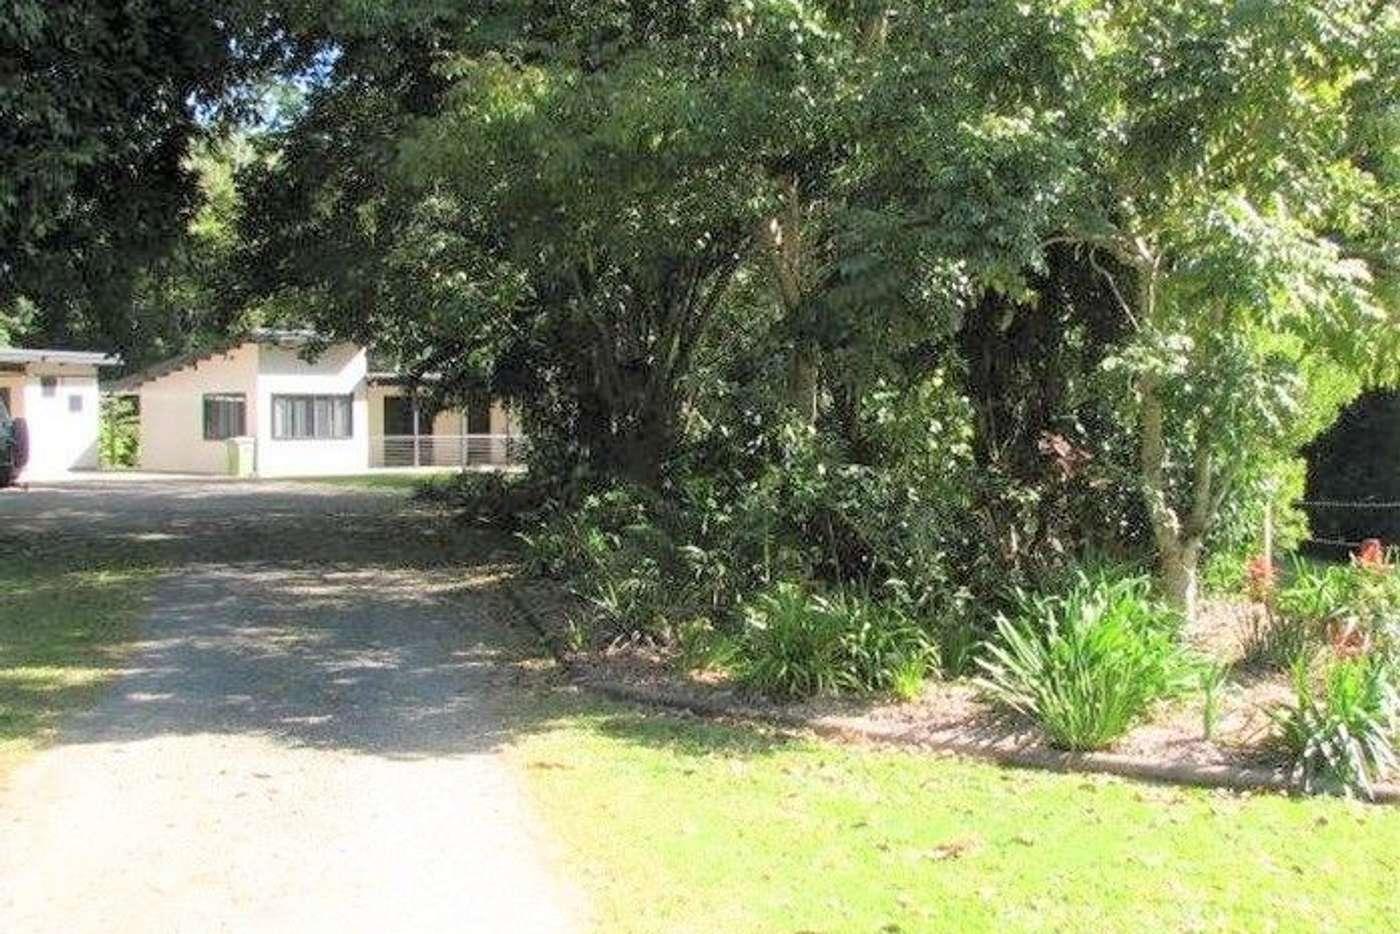 Main view of Homely house listing, 829 Pomona Kin Kin Road, Kin Kin QLD 4571